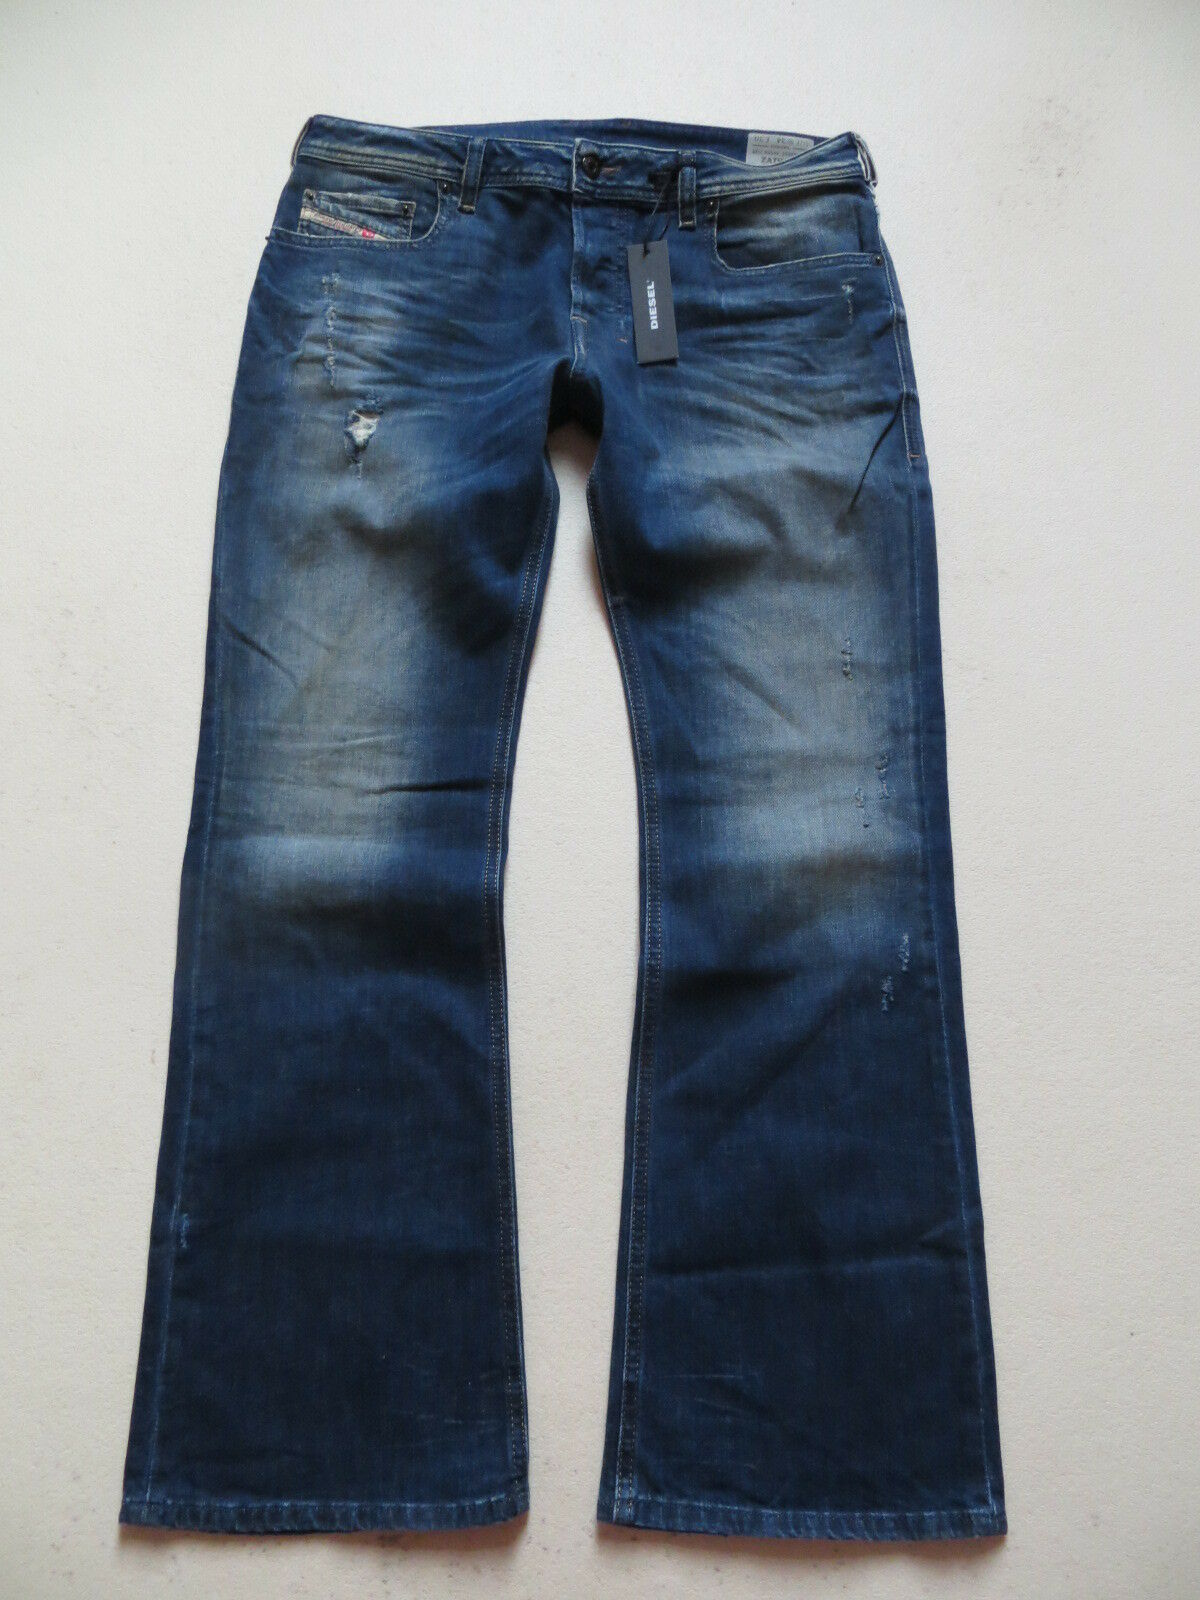 Diesel ZATHAN Stiefelcut Jeans Hose W 34  L 30 (32) NEU   wash R833F_stretch KULT